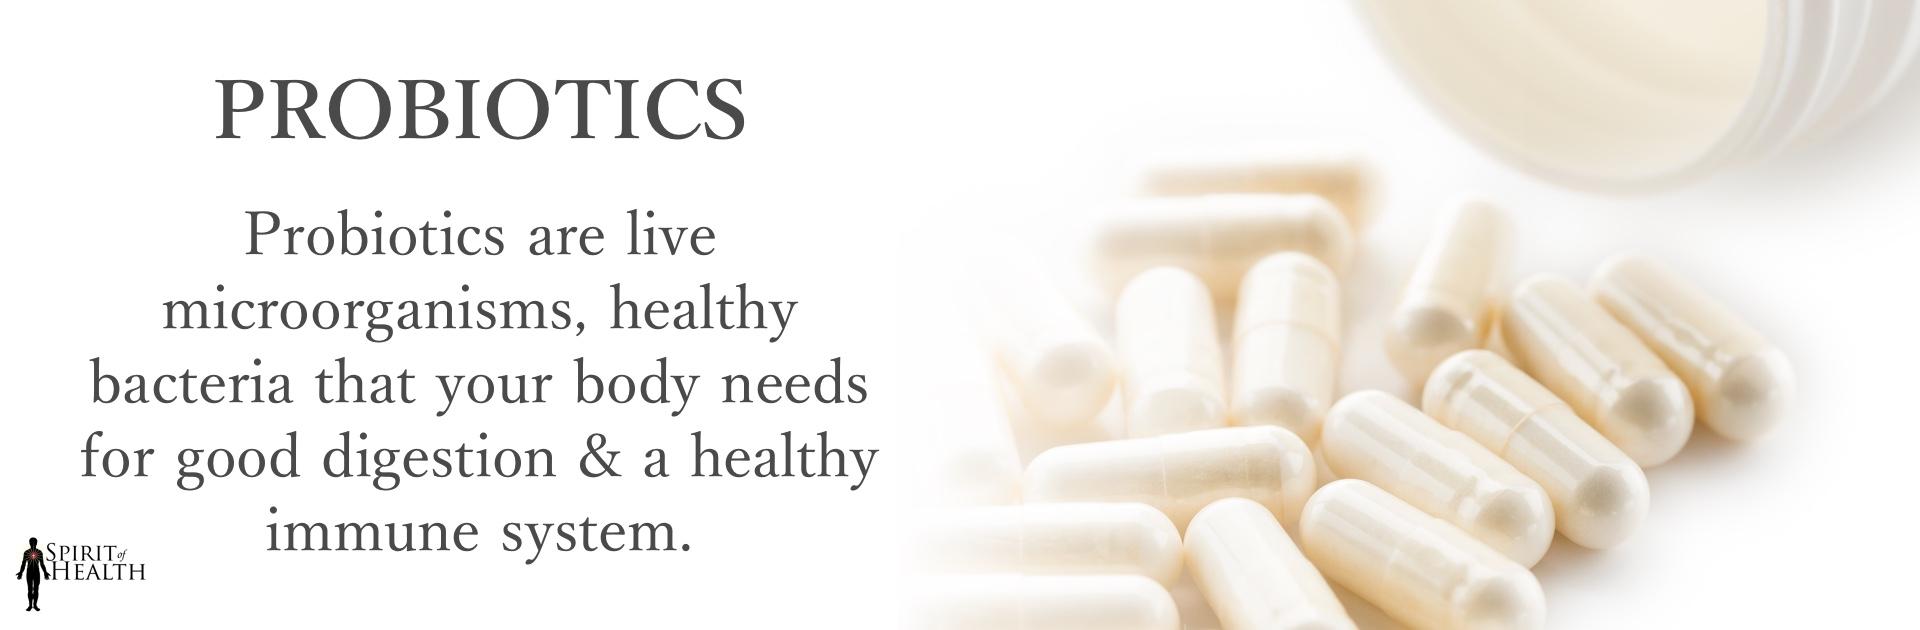 soh-store-banner-probiotics2.jpg